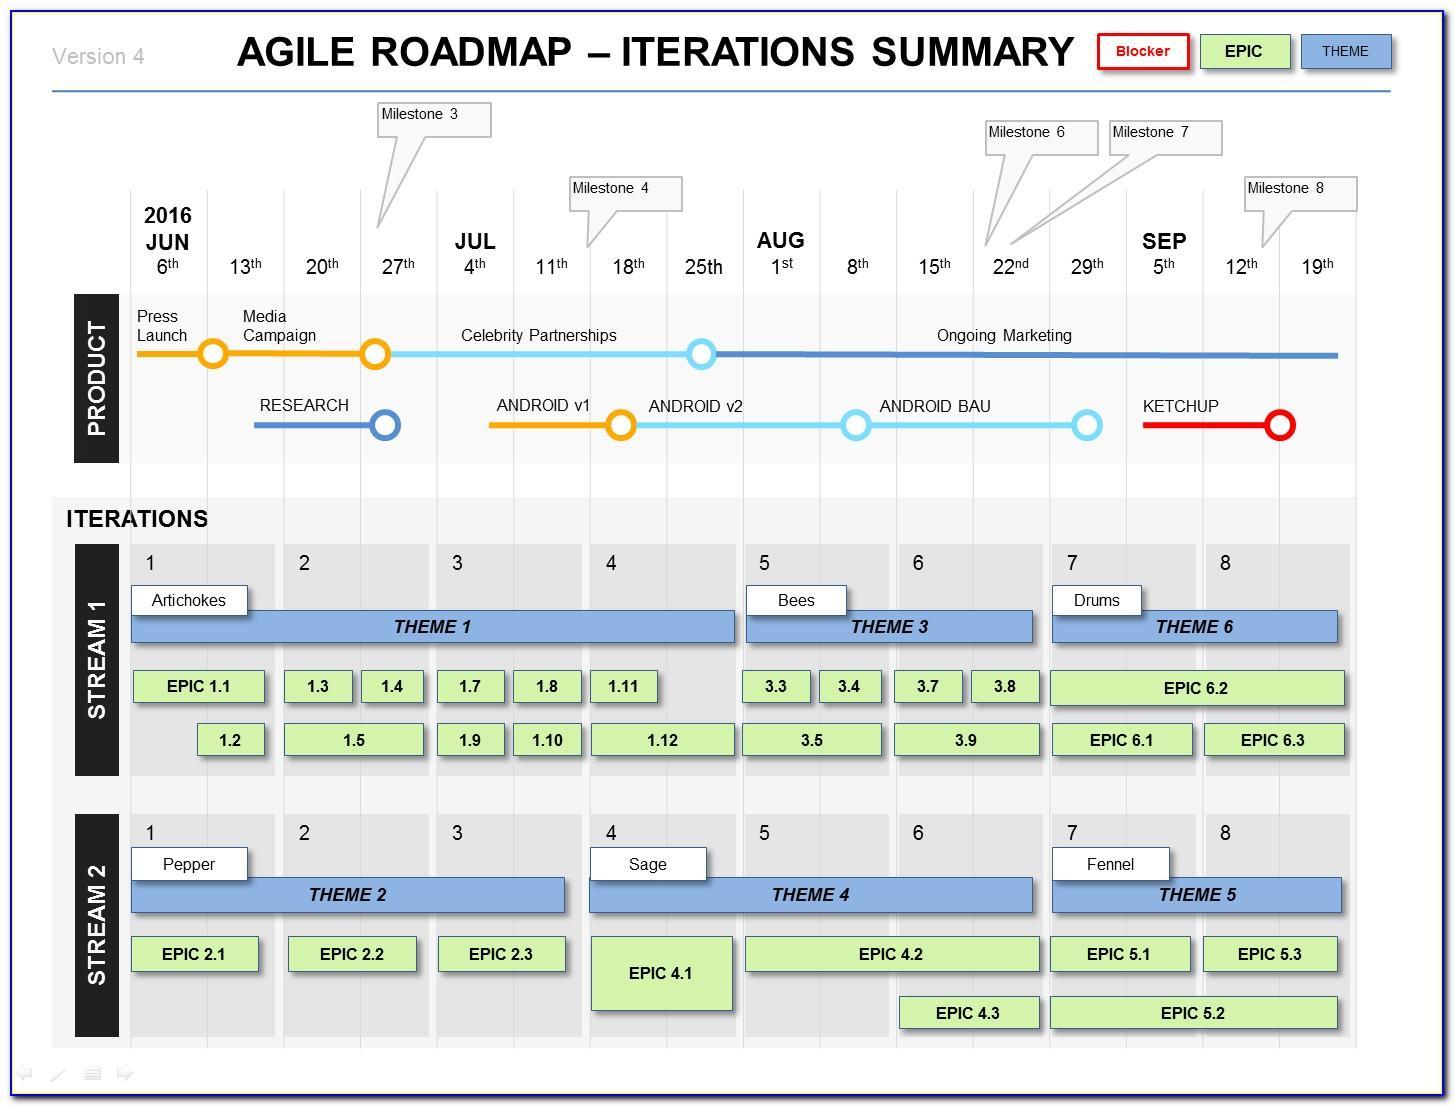 Agile Roadmap Template Visio